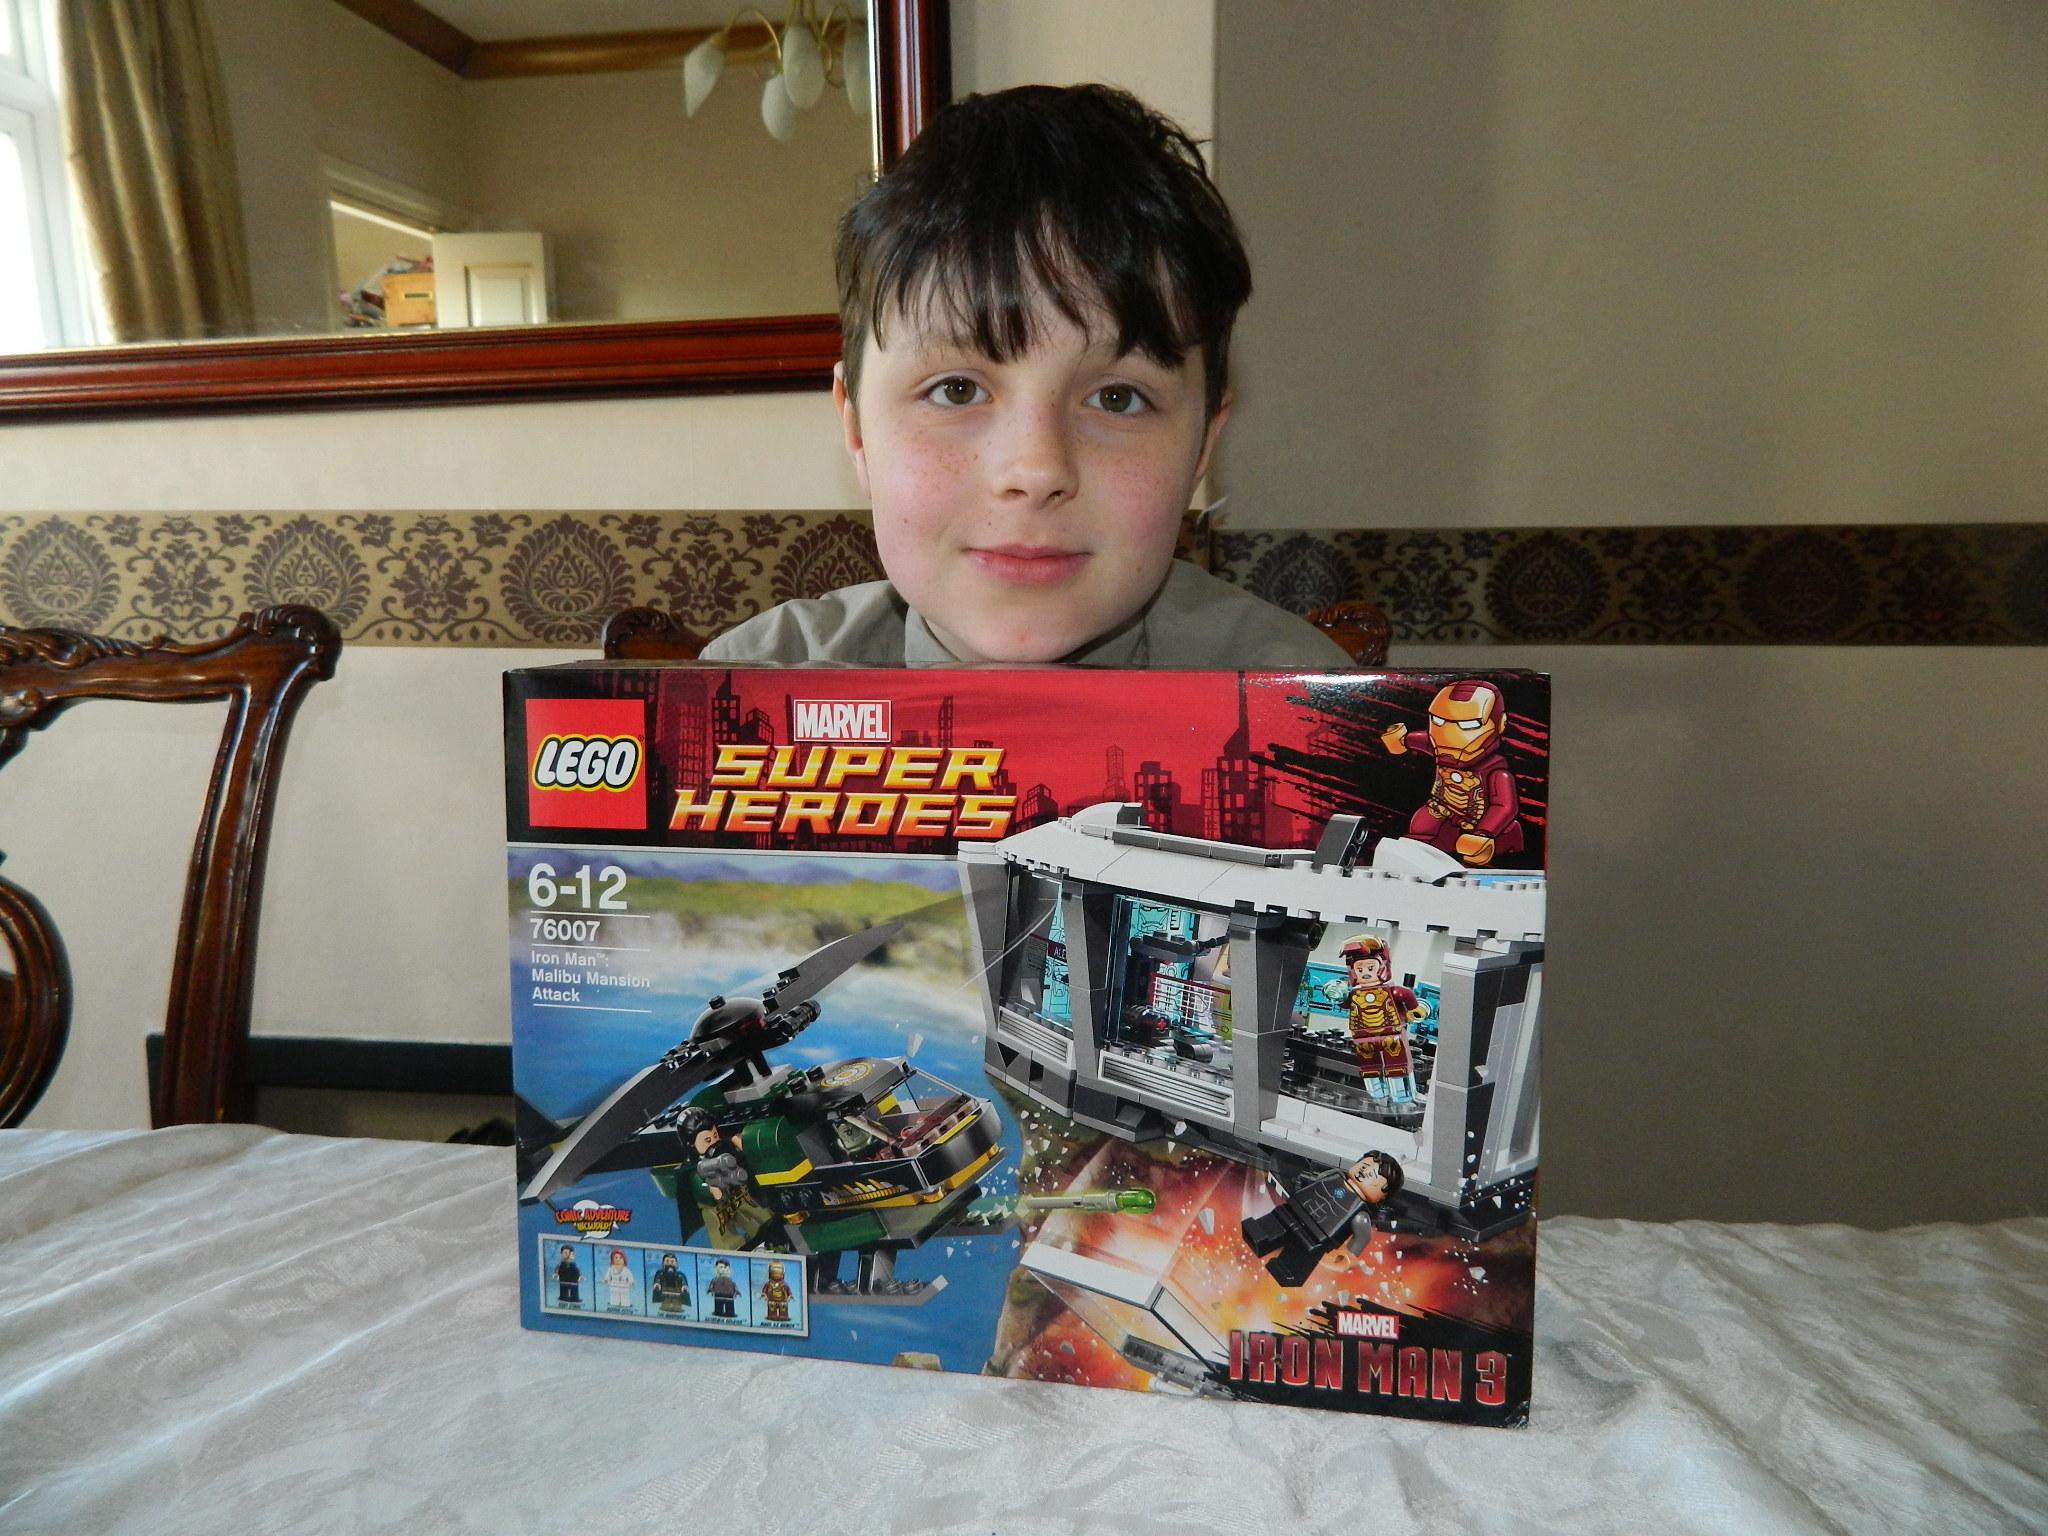 LEGO: Marvel Super Heroes – Ironman 3